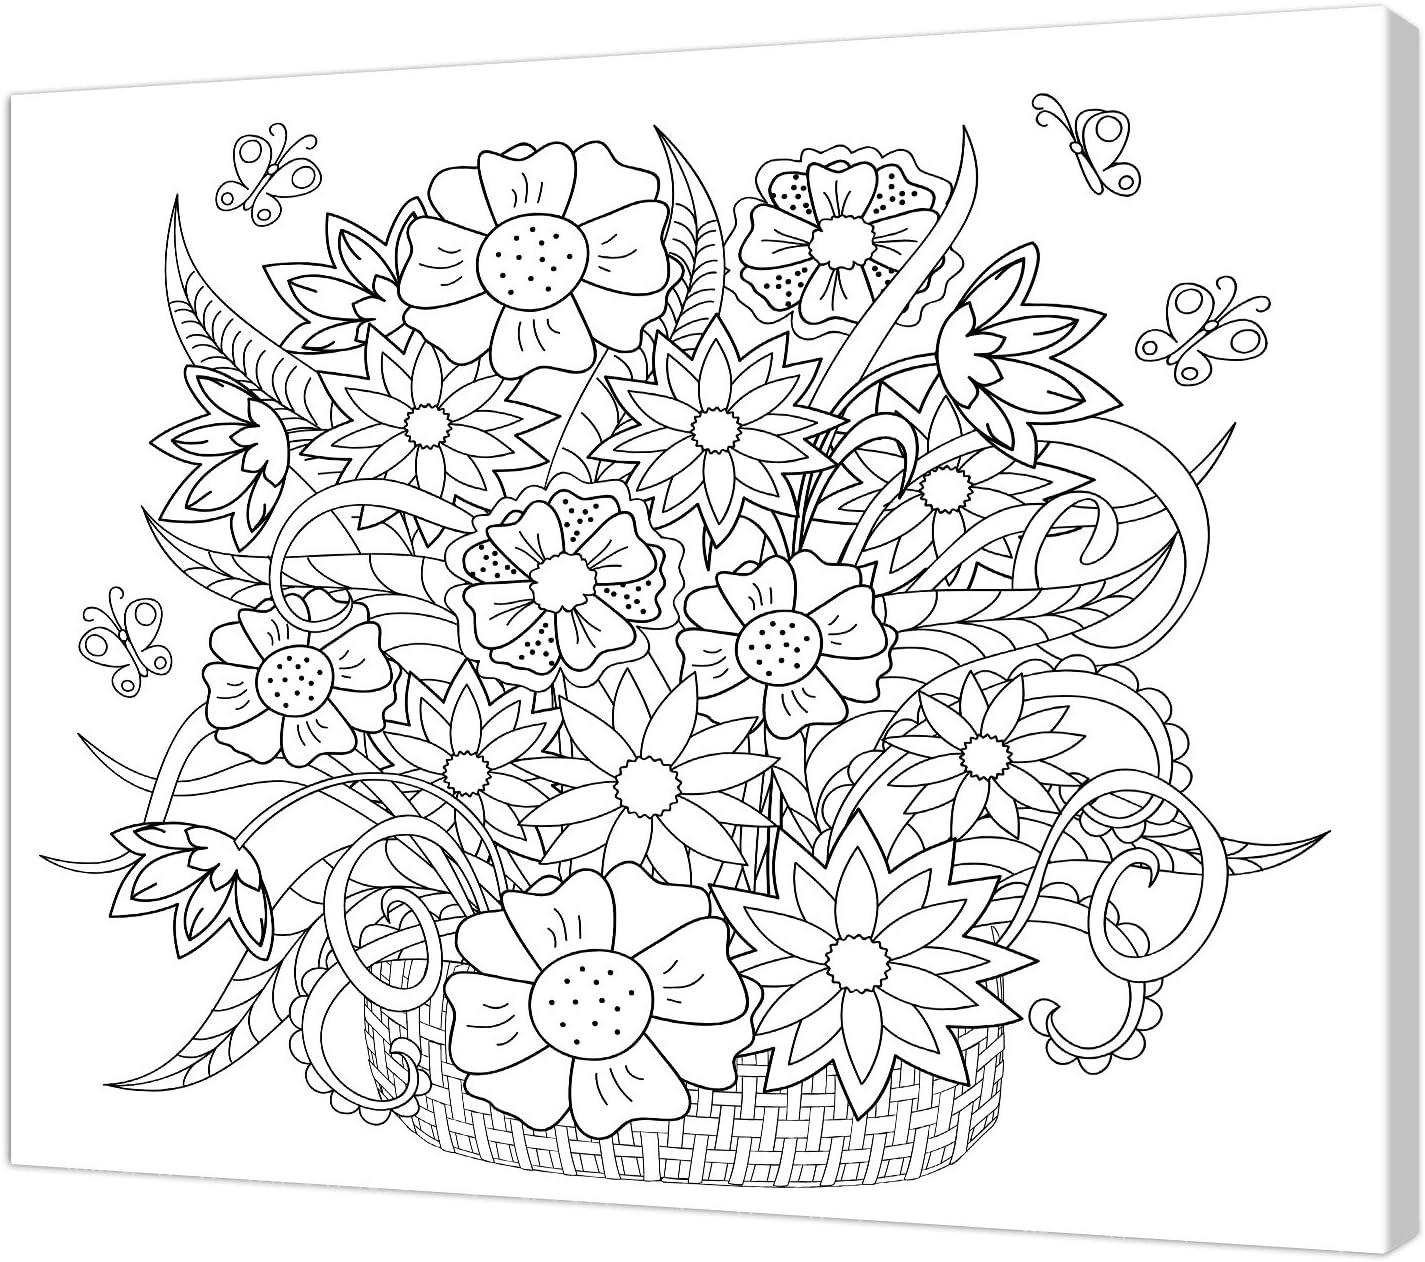 40/x 50/x 3.5/cm Pintcolor 7813.0/Marco con Lienzo Impreso de Colorear Madera de Abeto Blanco//Negro